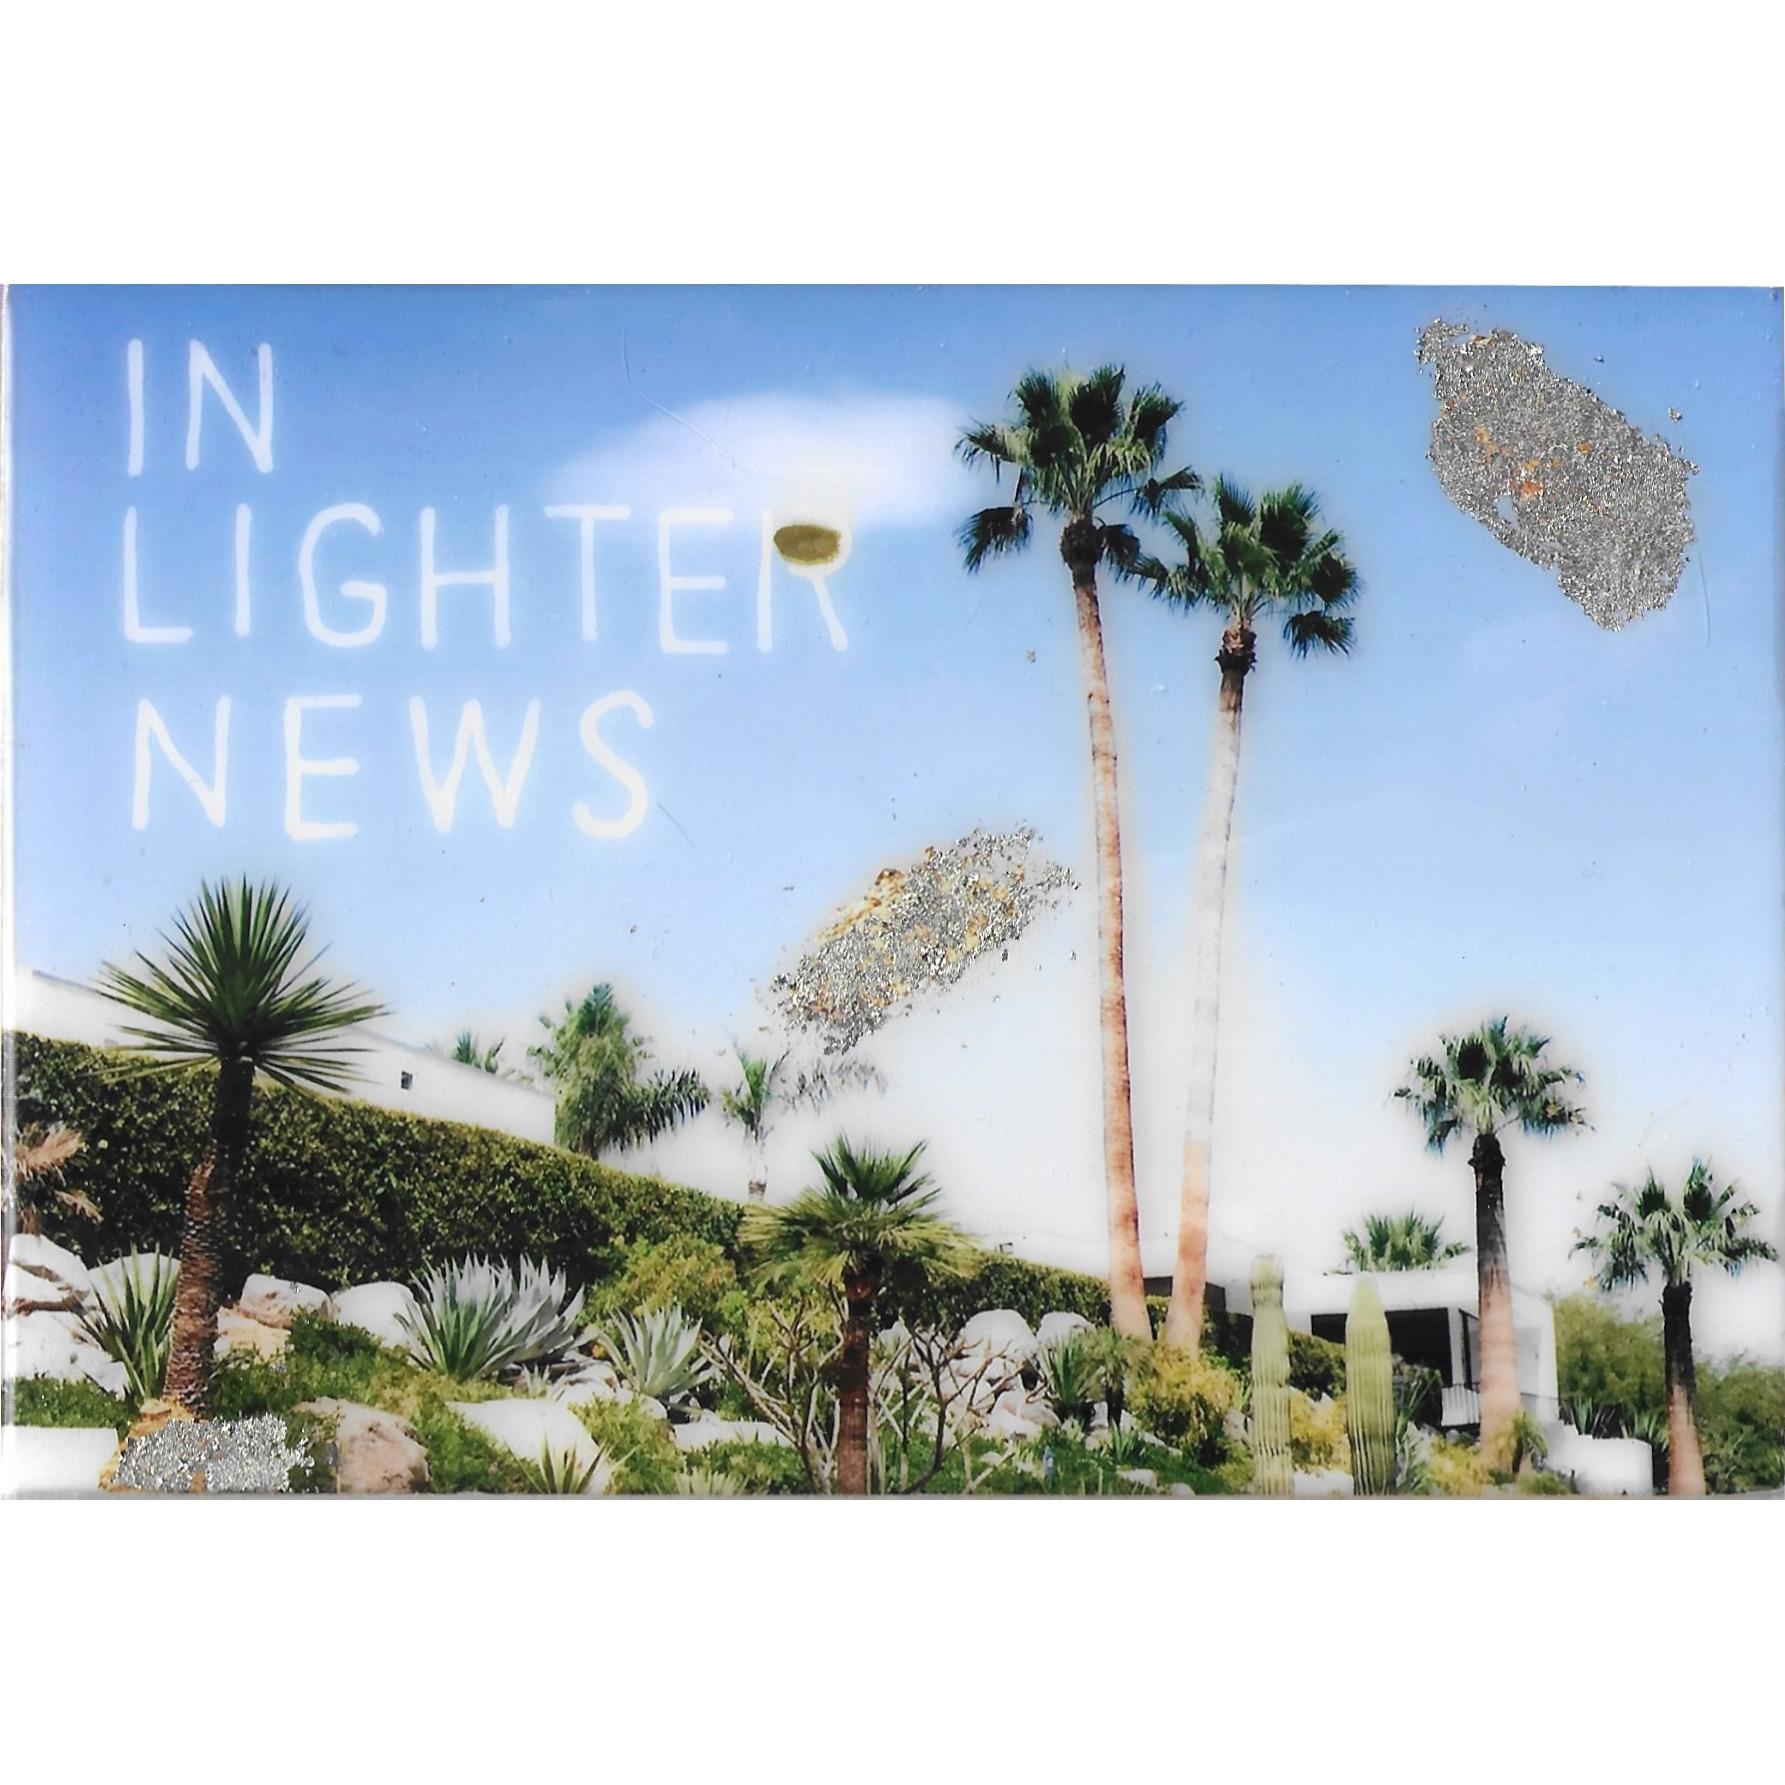 In Lighter News by Talia Shipman